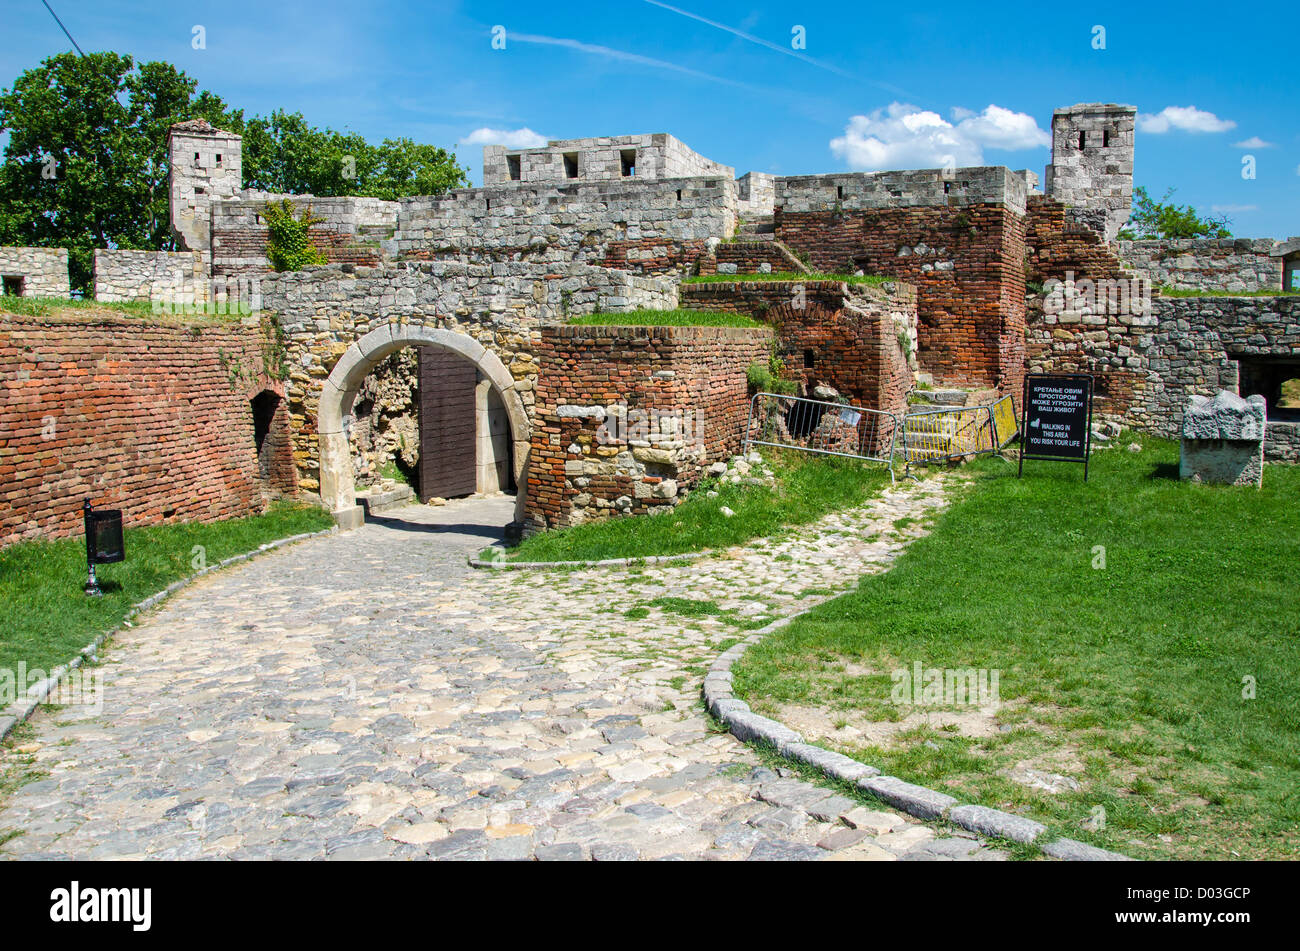 Kalemegdan Fortress, Belgrade - Stock Image